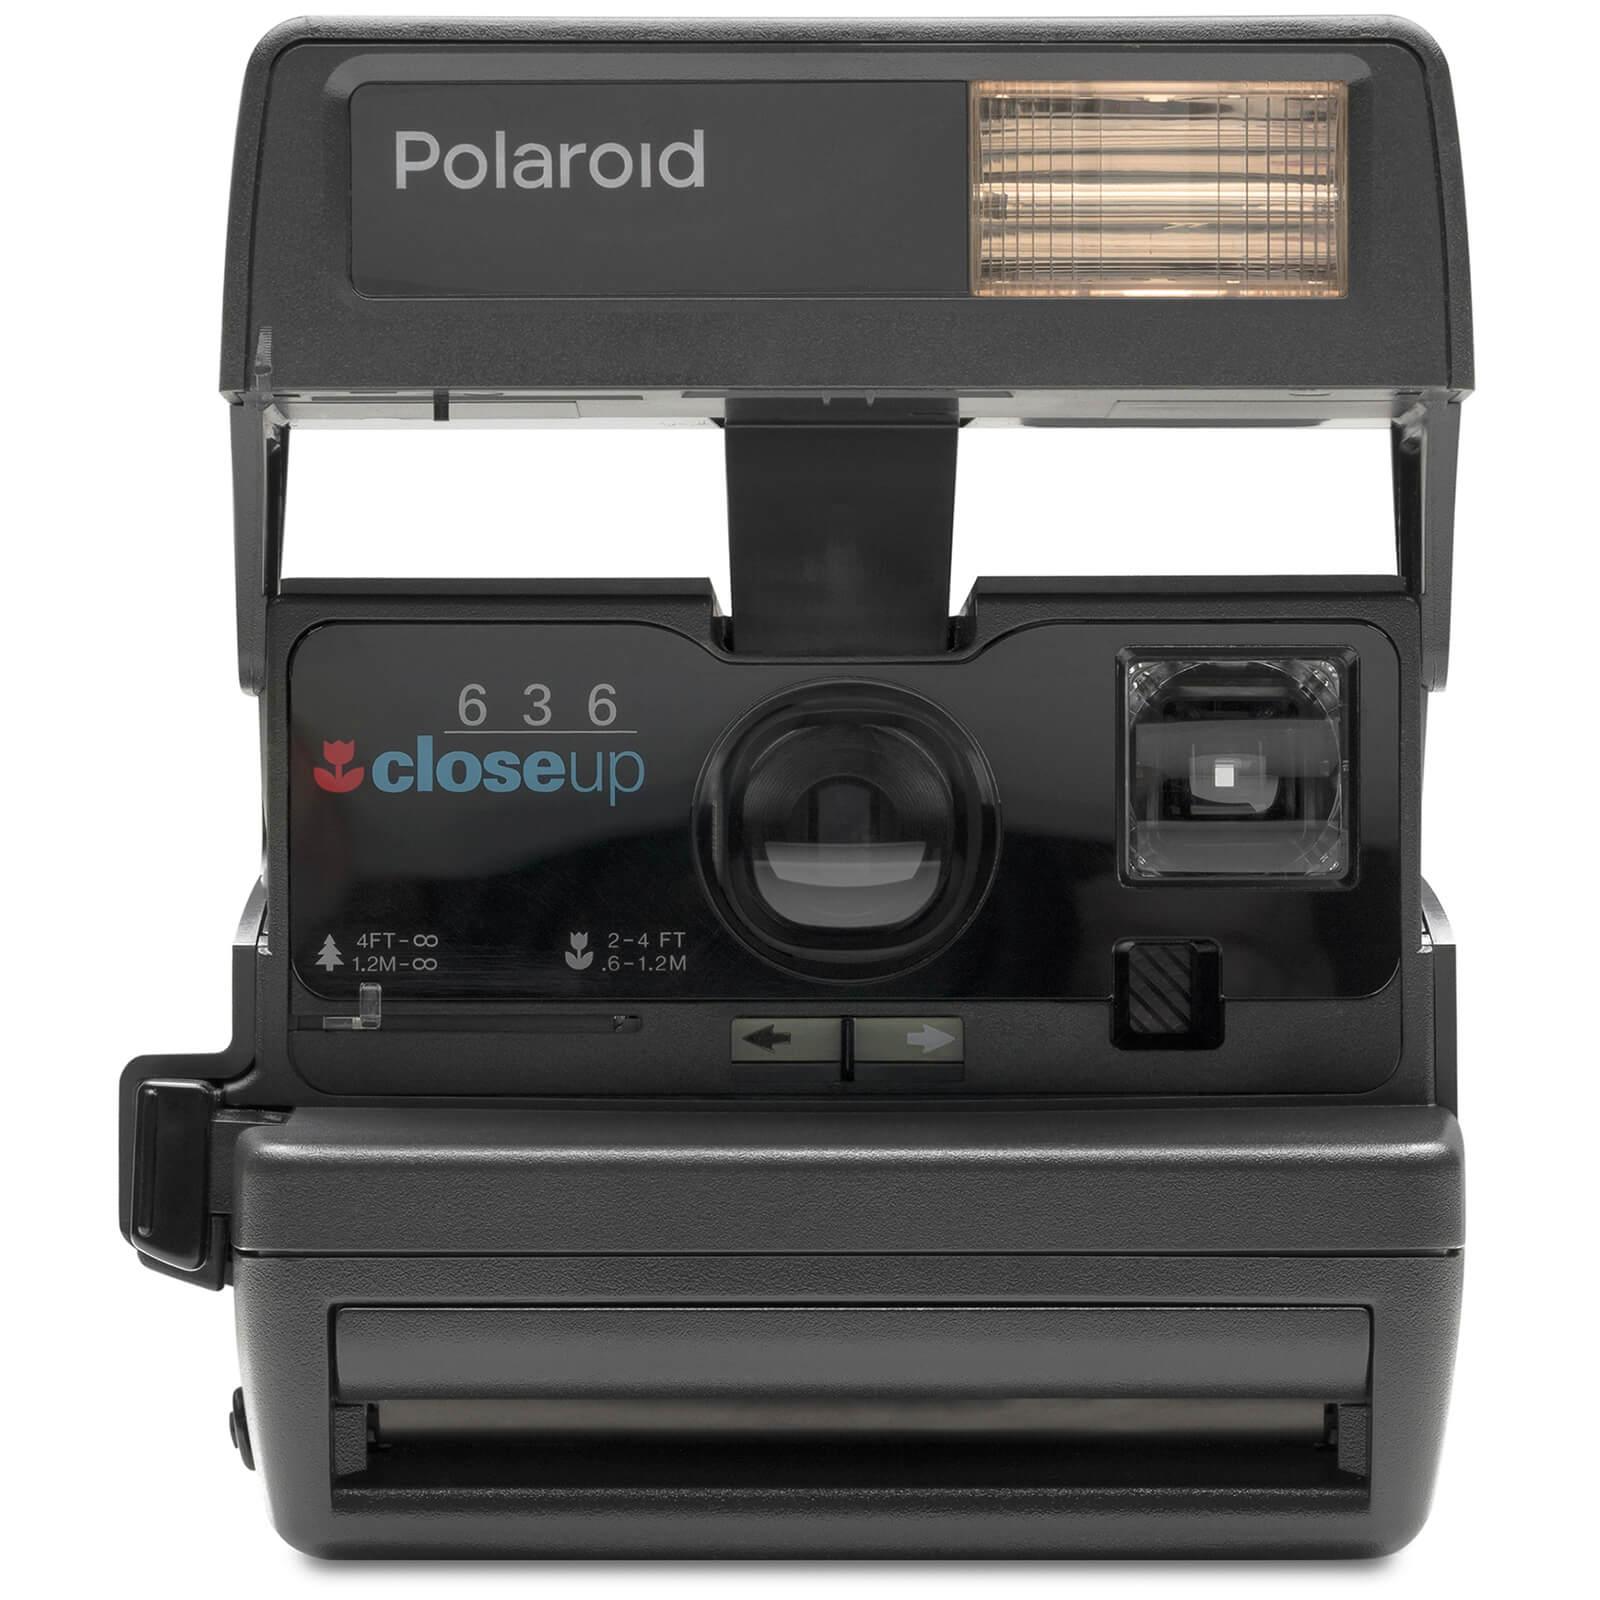 Polaroid 600 Camera - Close Up - Vintage Refurb - Grade A-